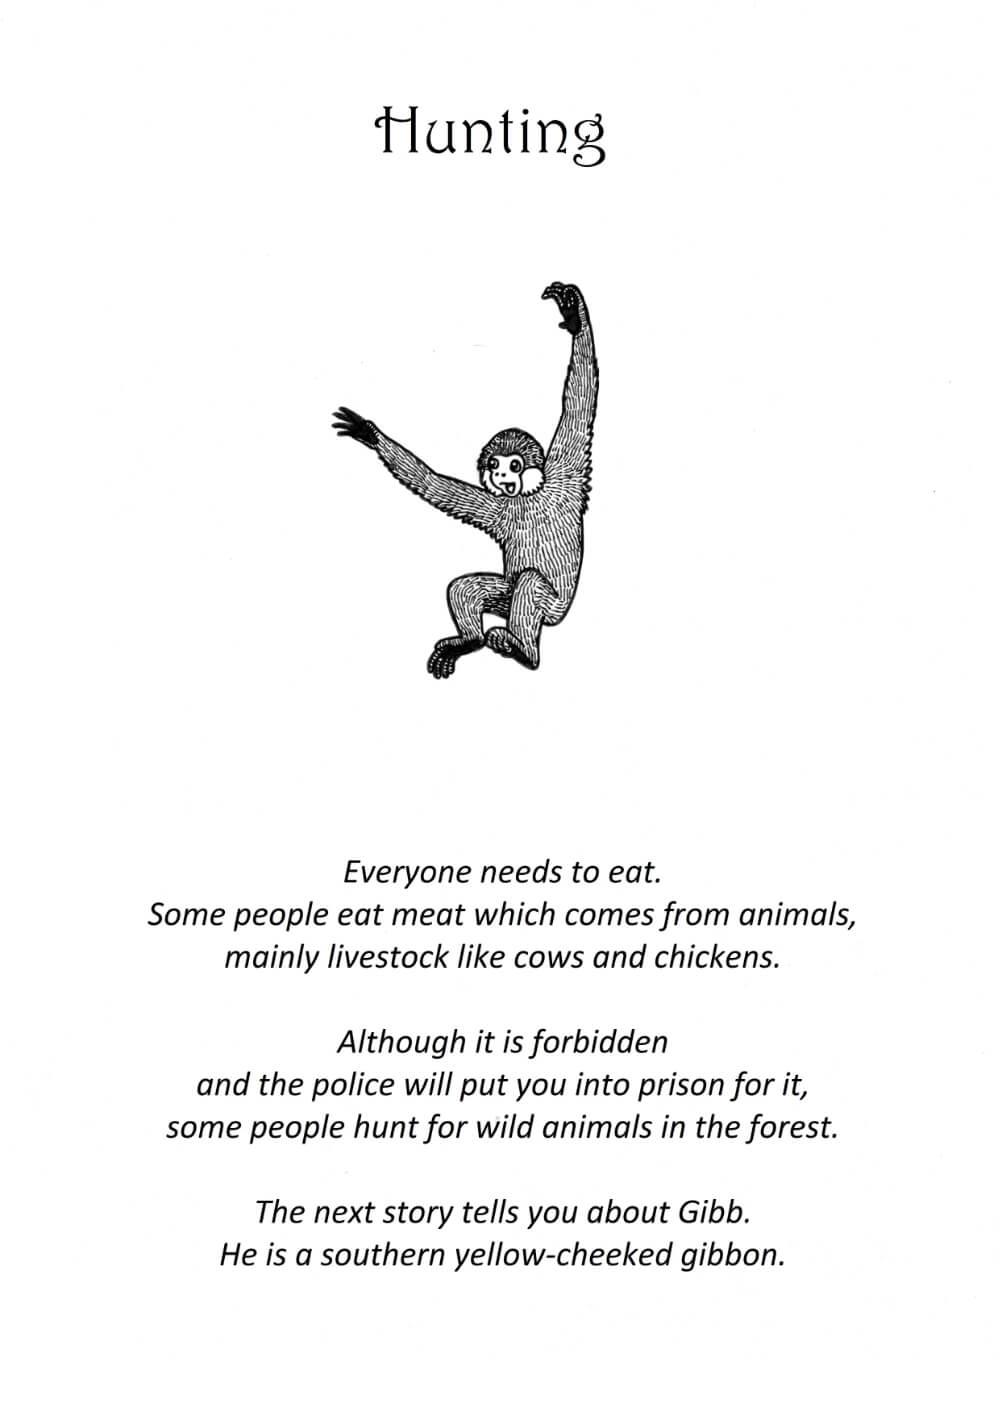 Tails of Cambodia - Primate conservation education book - Copyright Brenda de Groot